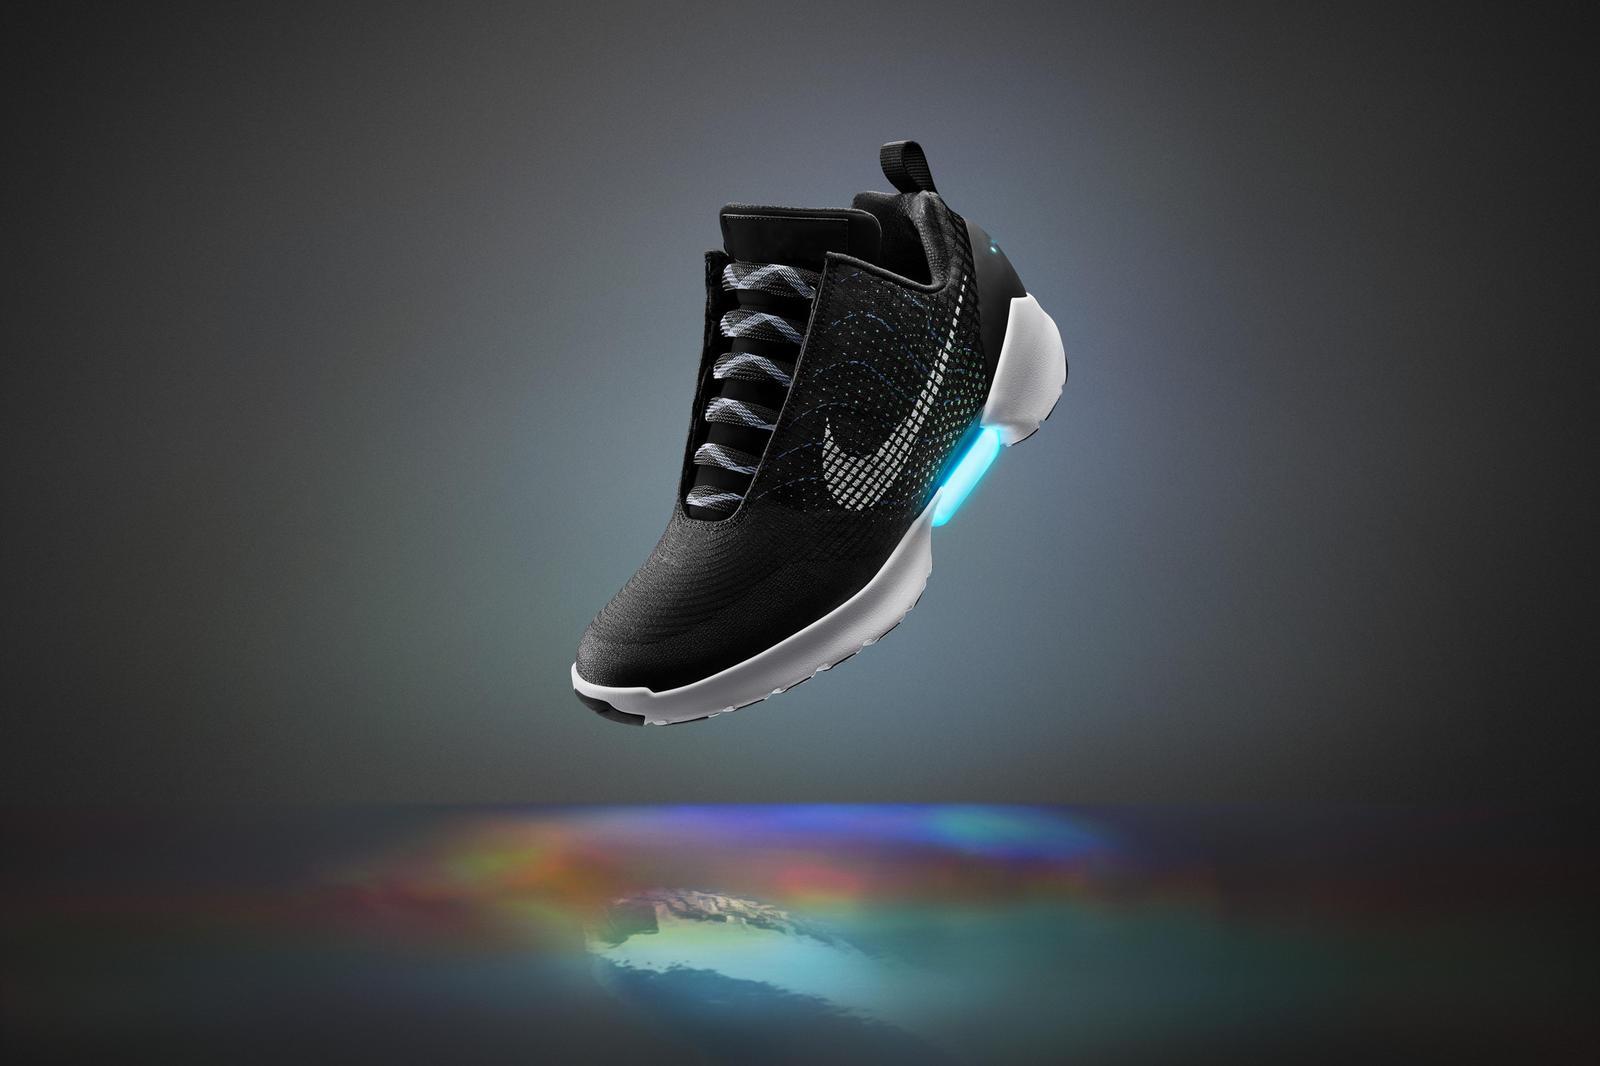 nike shoes 12001607 clock parts 917620